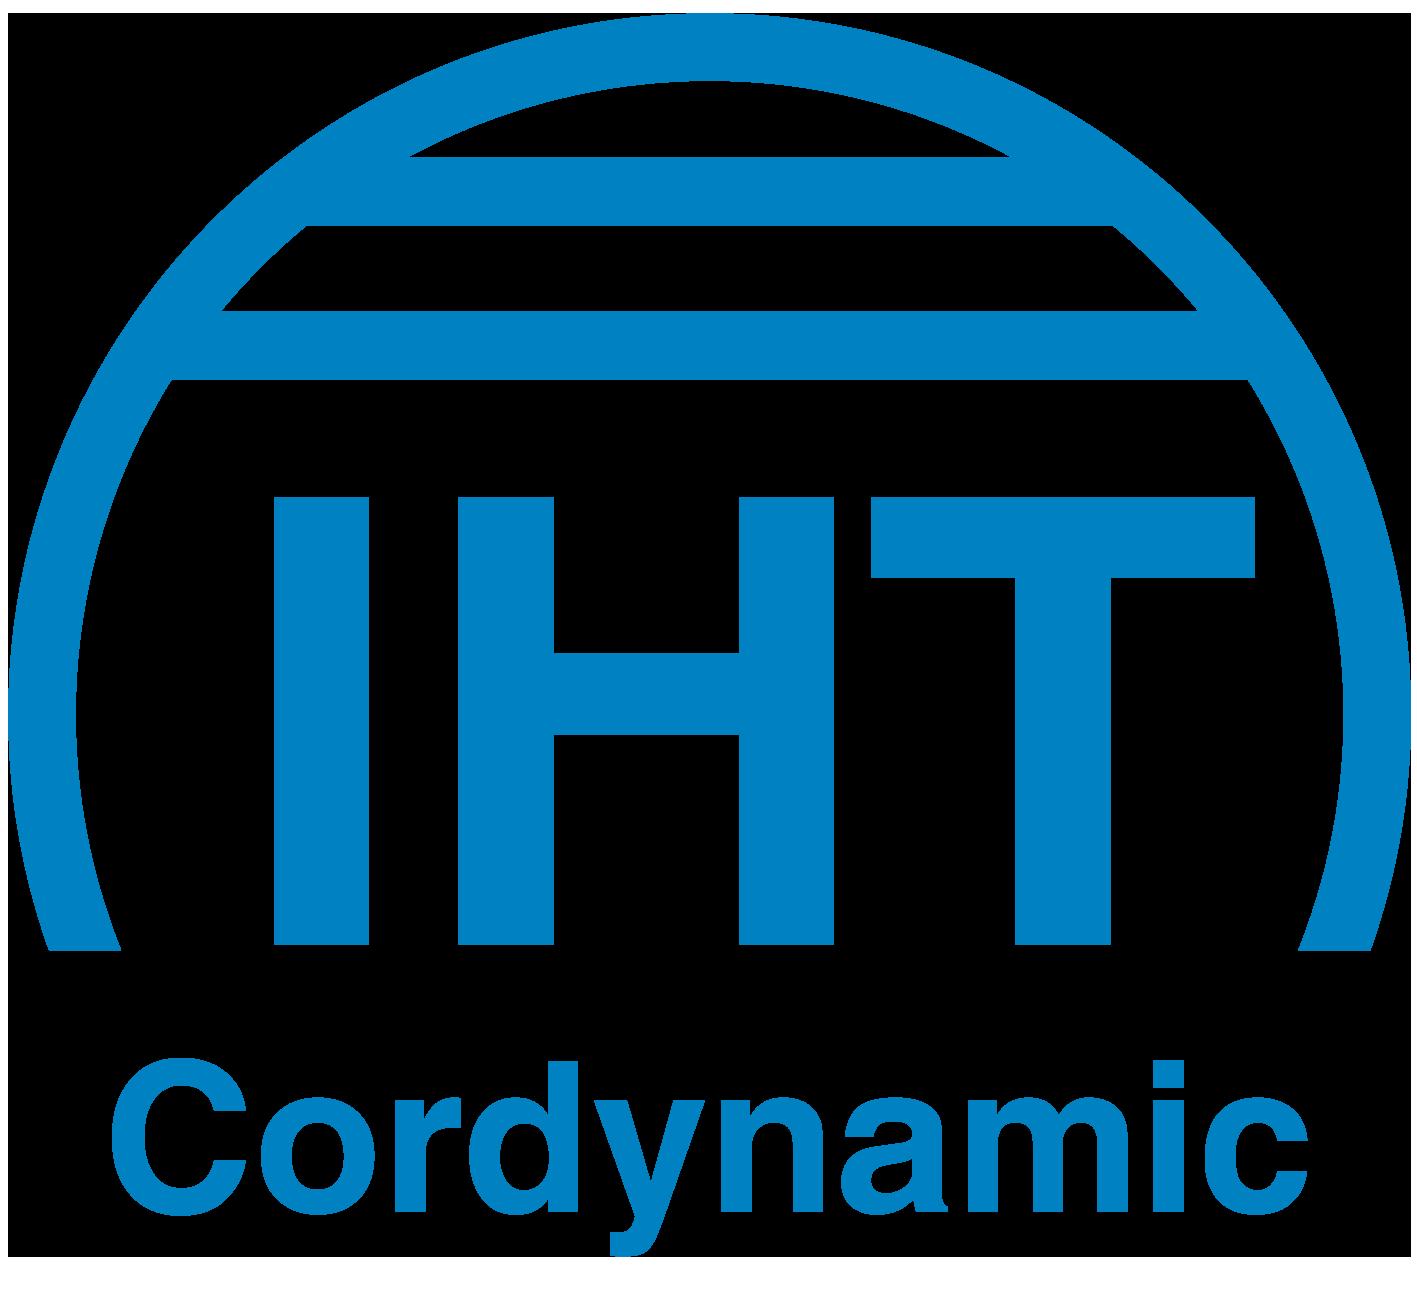 IHT Cordynamic